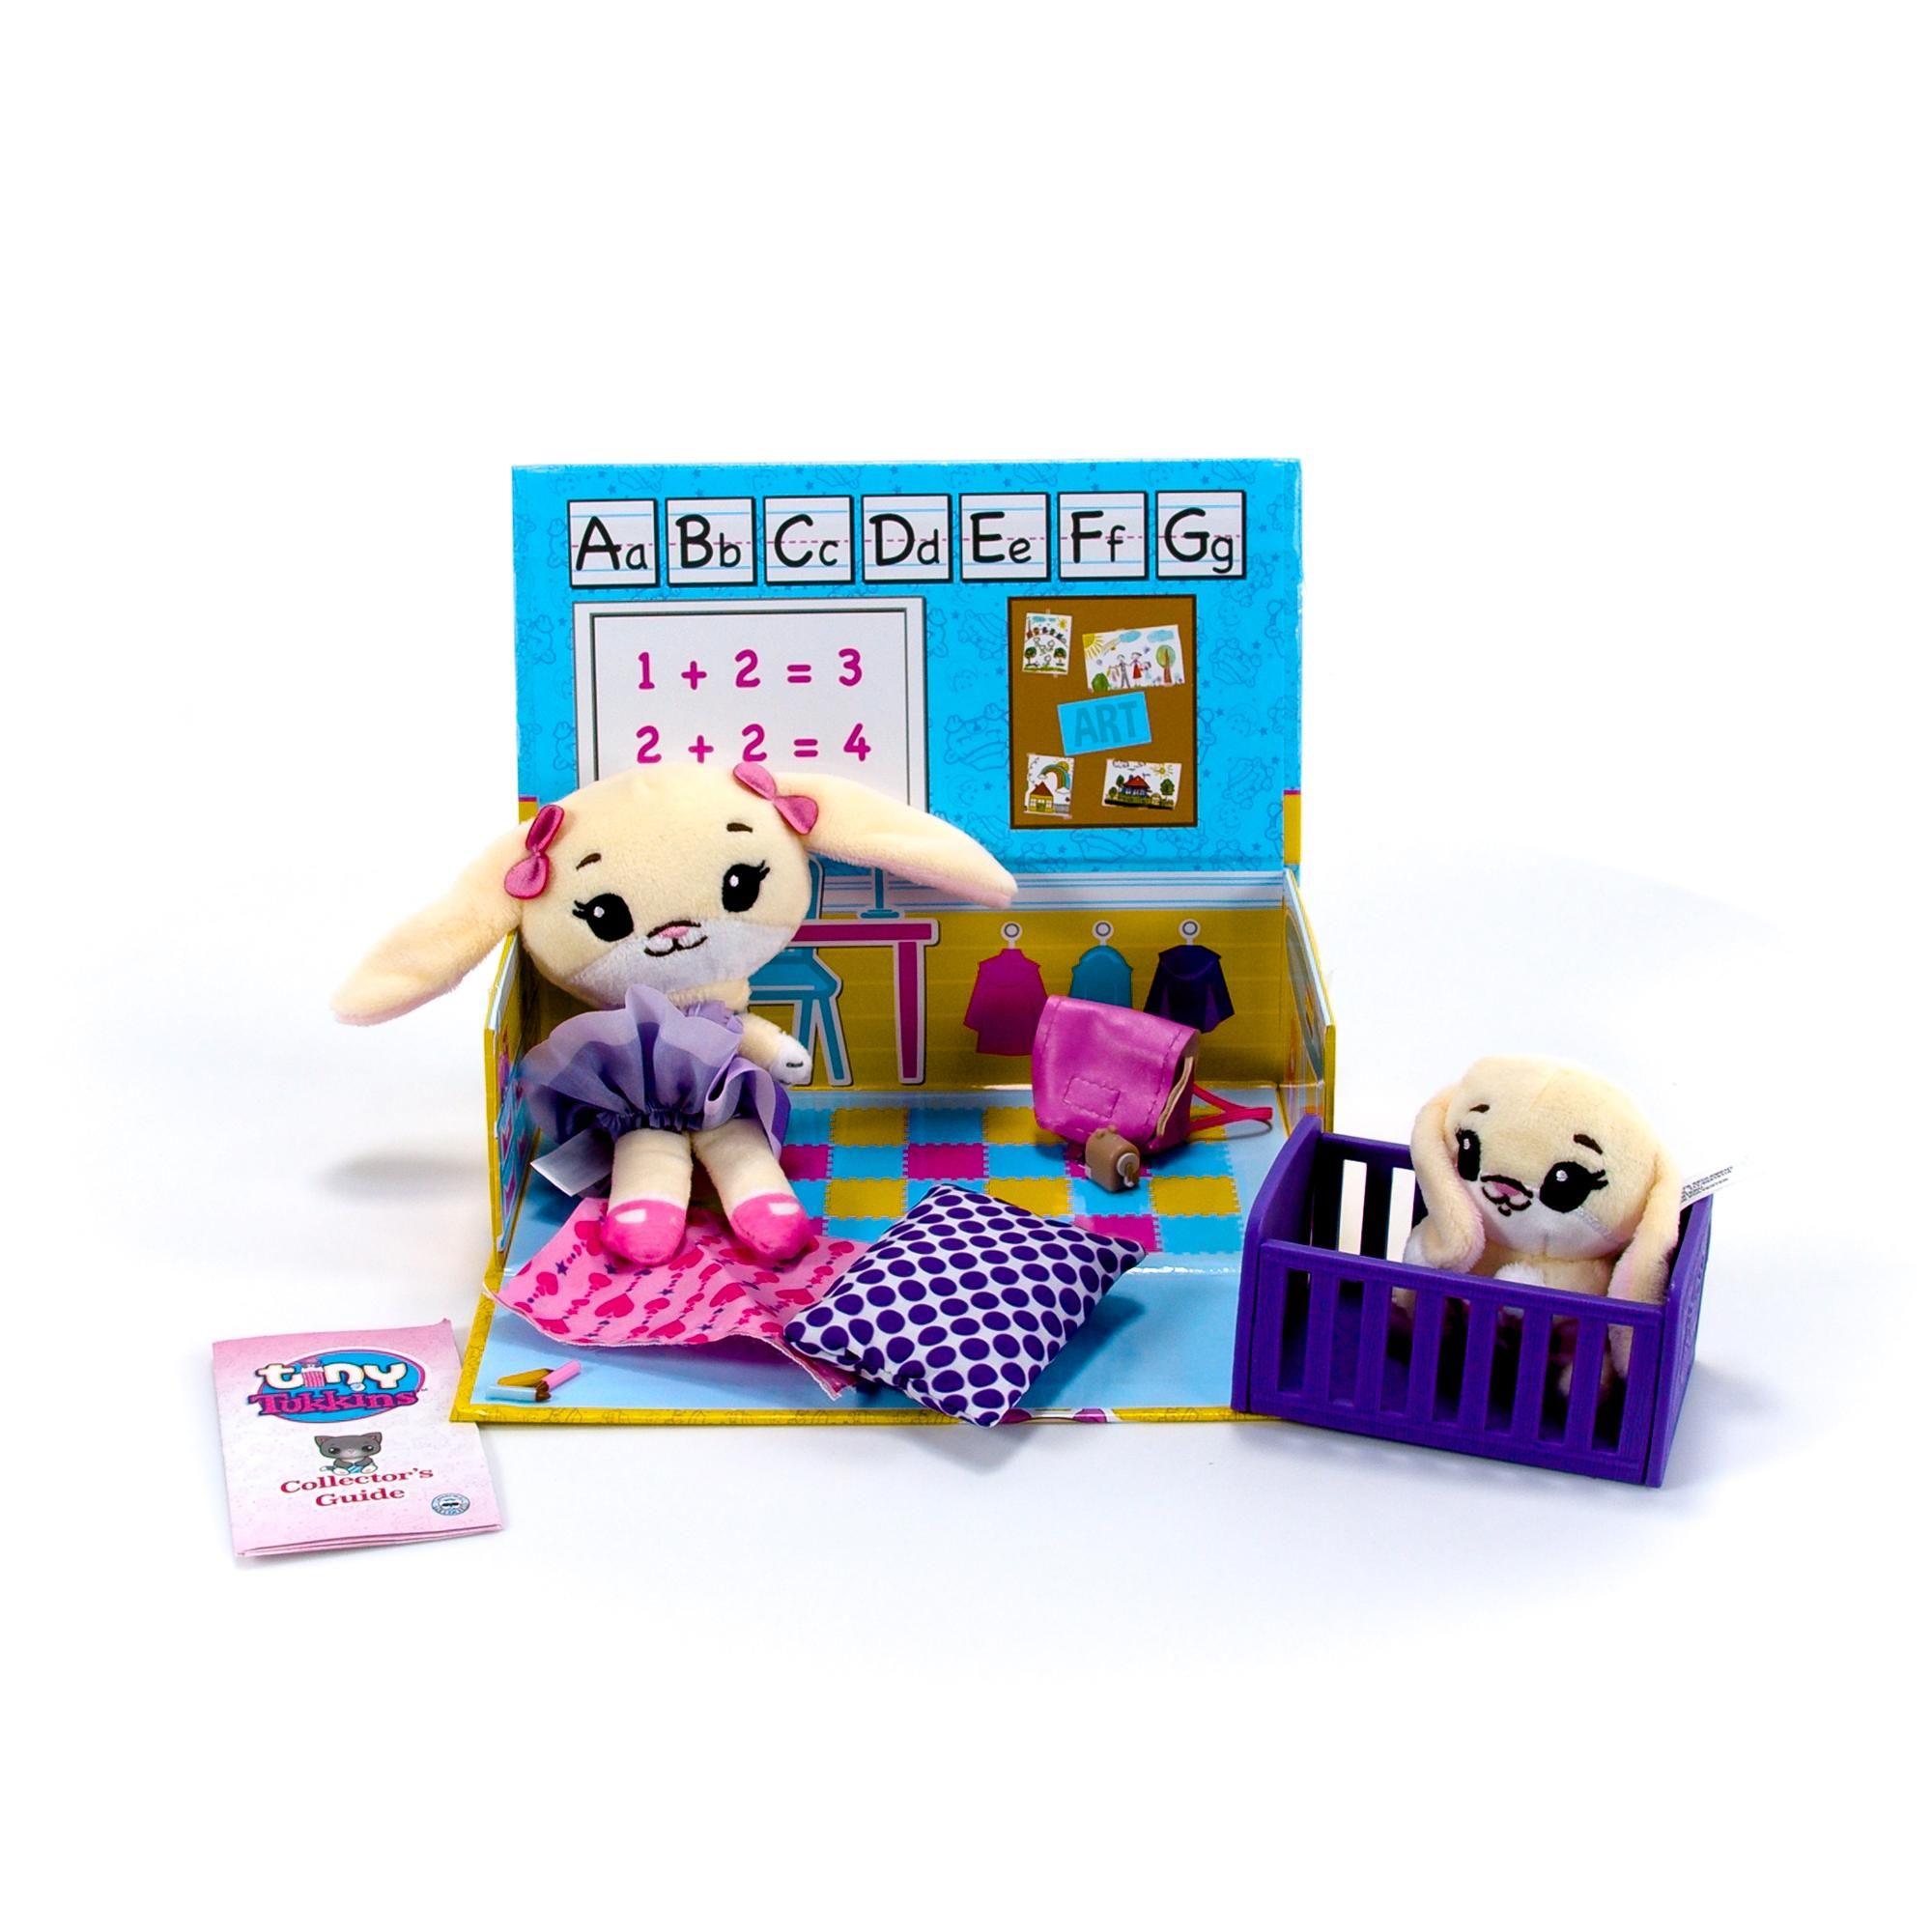 Tiny Tukkins Playset Assortment with Plush Stuffed